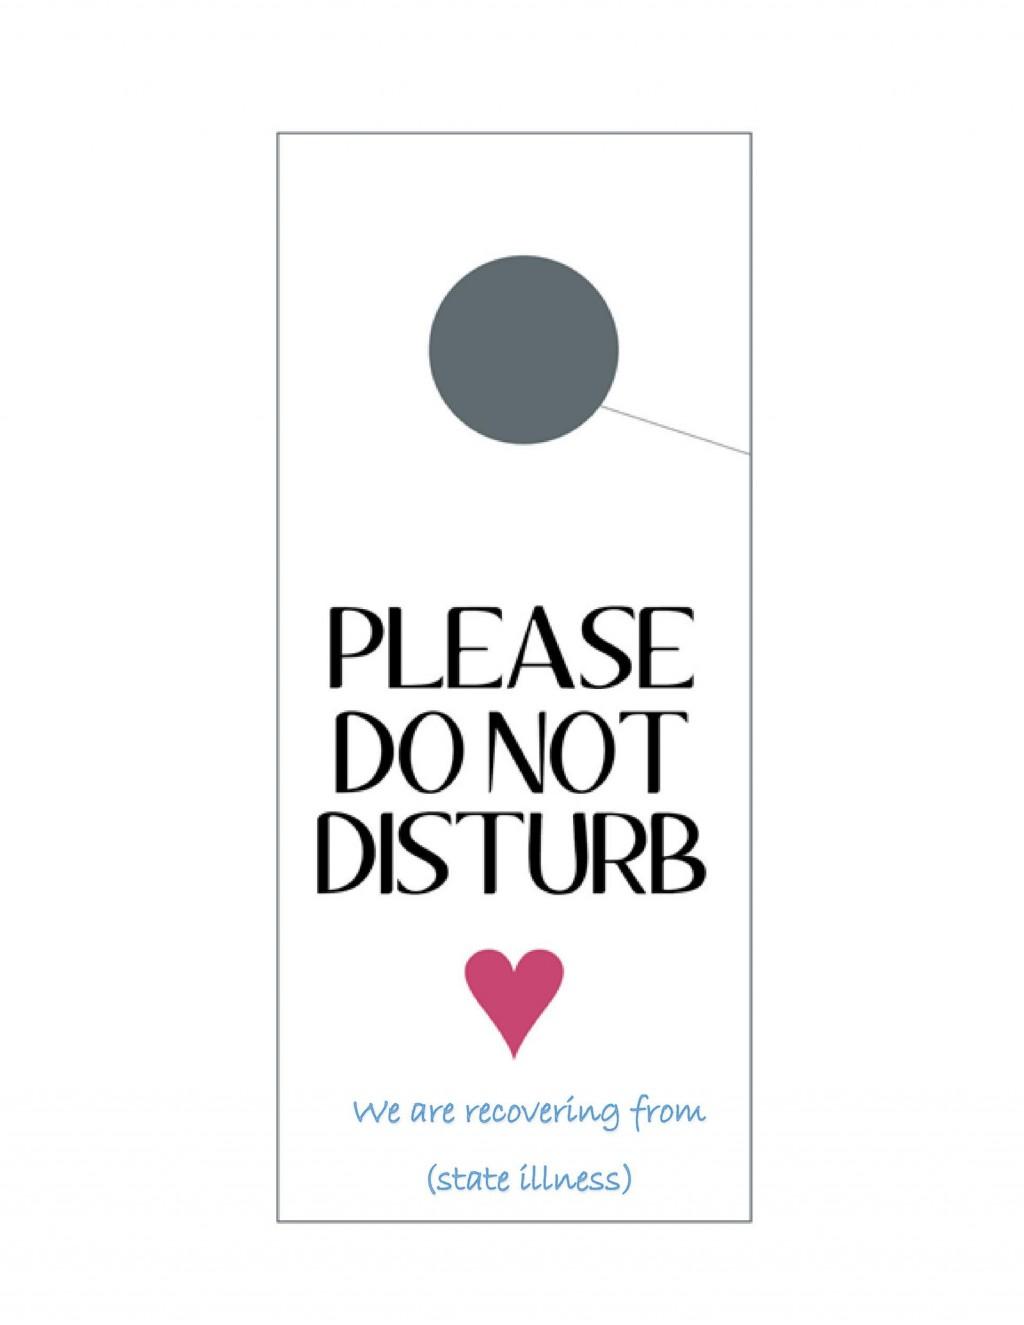 003 Best Free Printable Door Hanger Template Idea  Templates Wedding EditableLarge